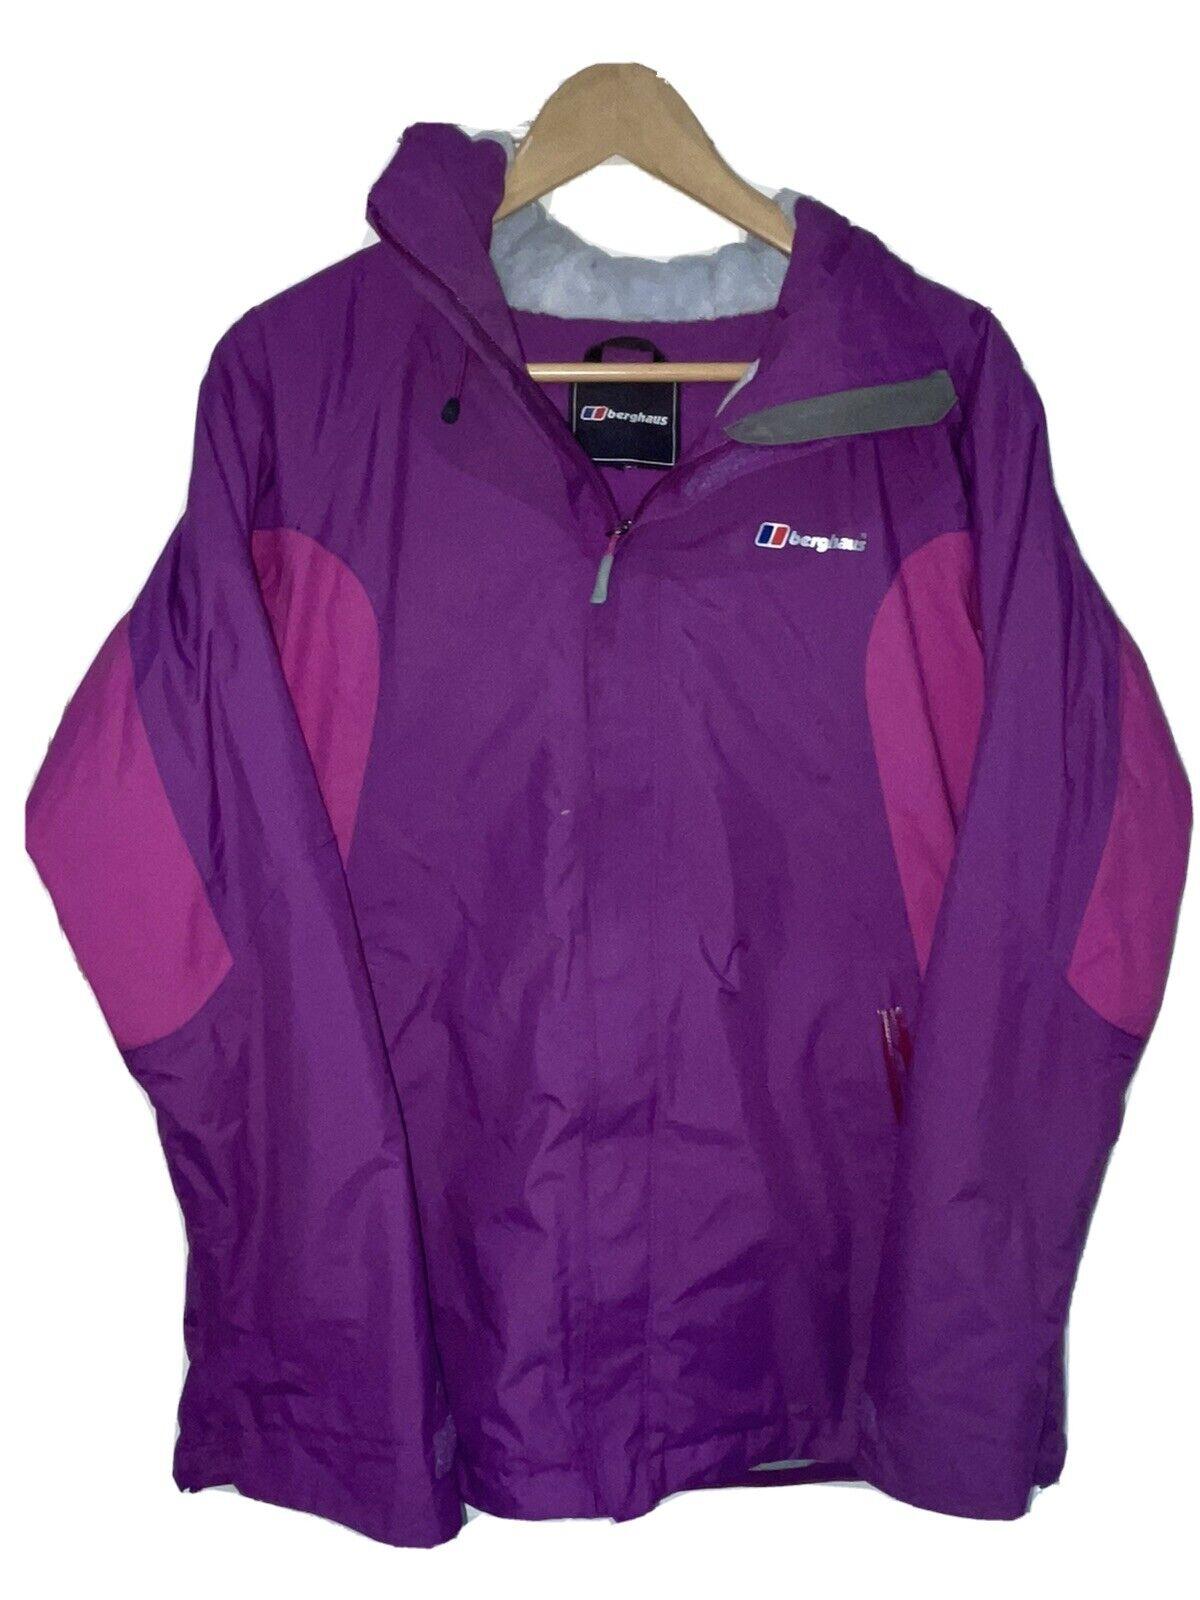 Womens Purple Berghaus AQ2 Waterproof Hooded Jacket - Size 12 (M)